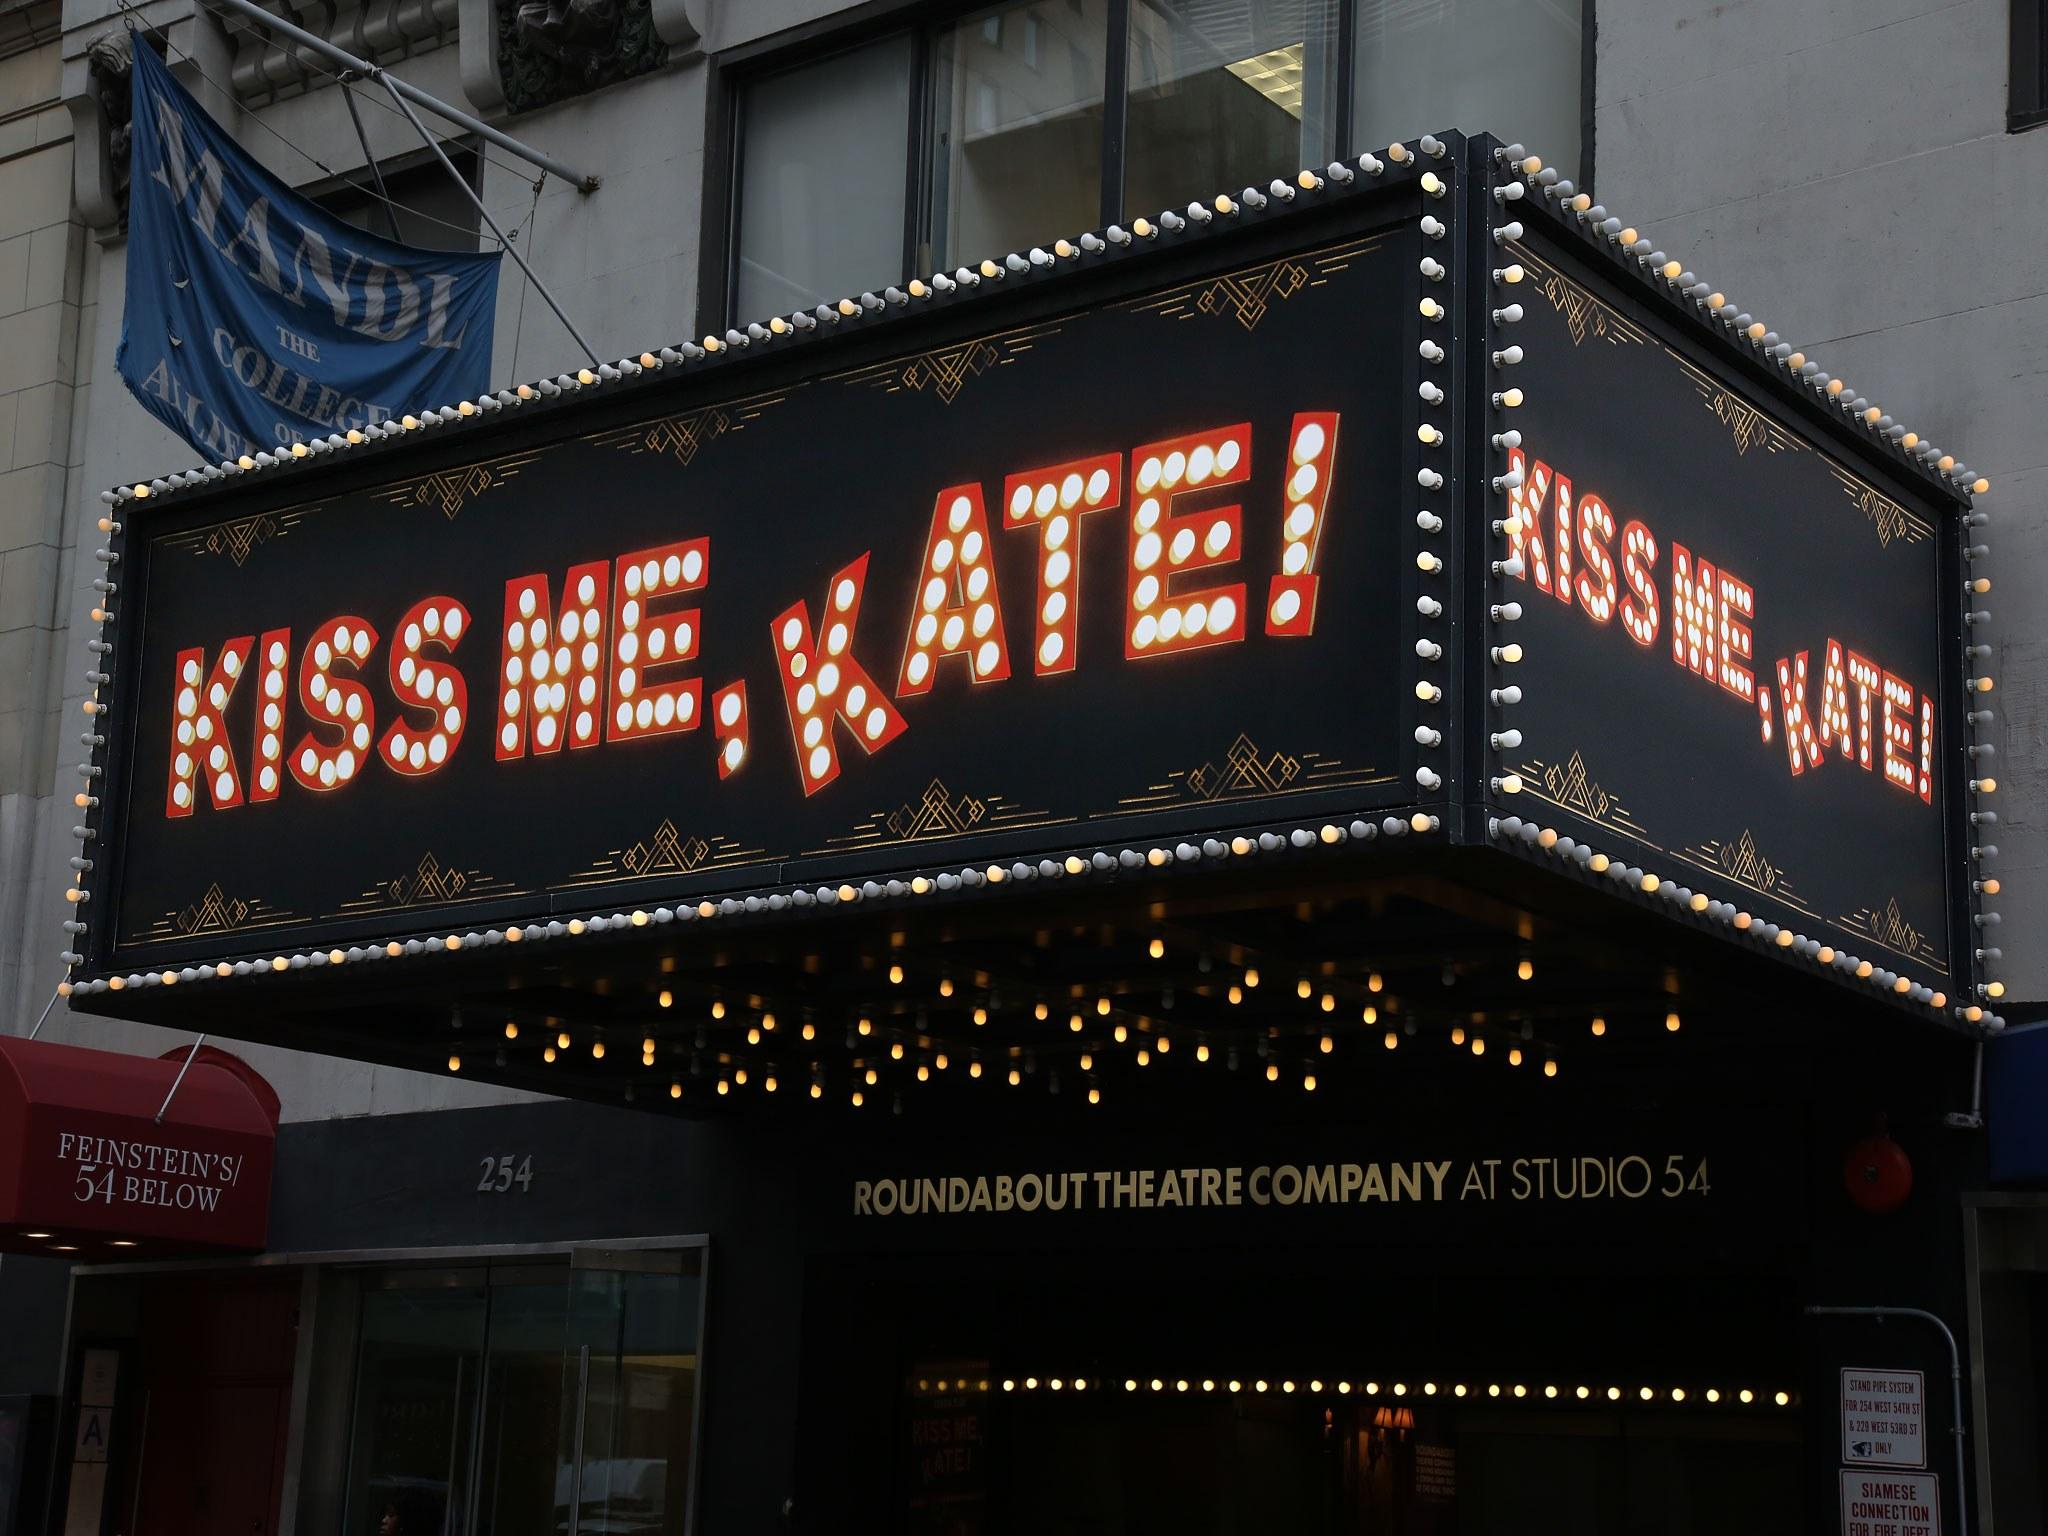 Kiss Me Kate at Studio 54 Theatre